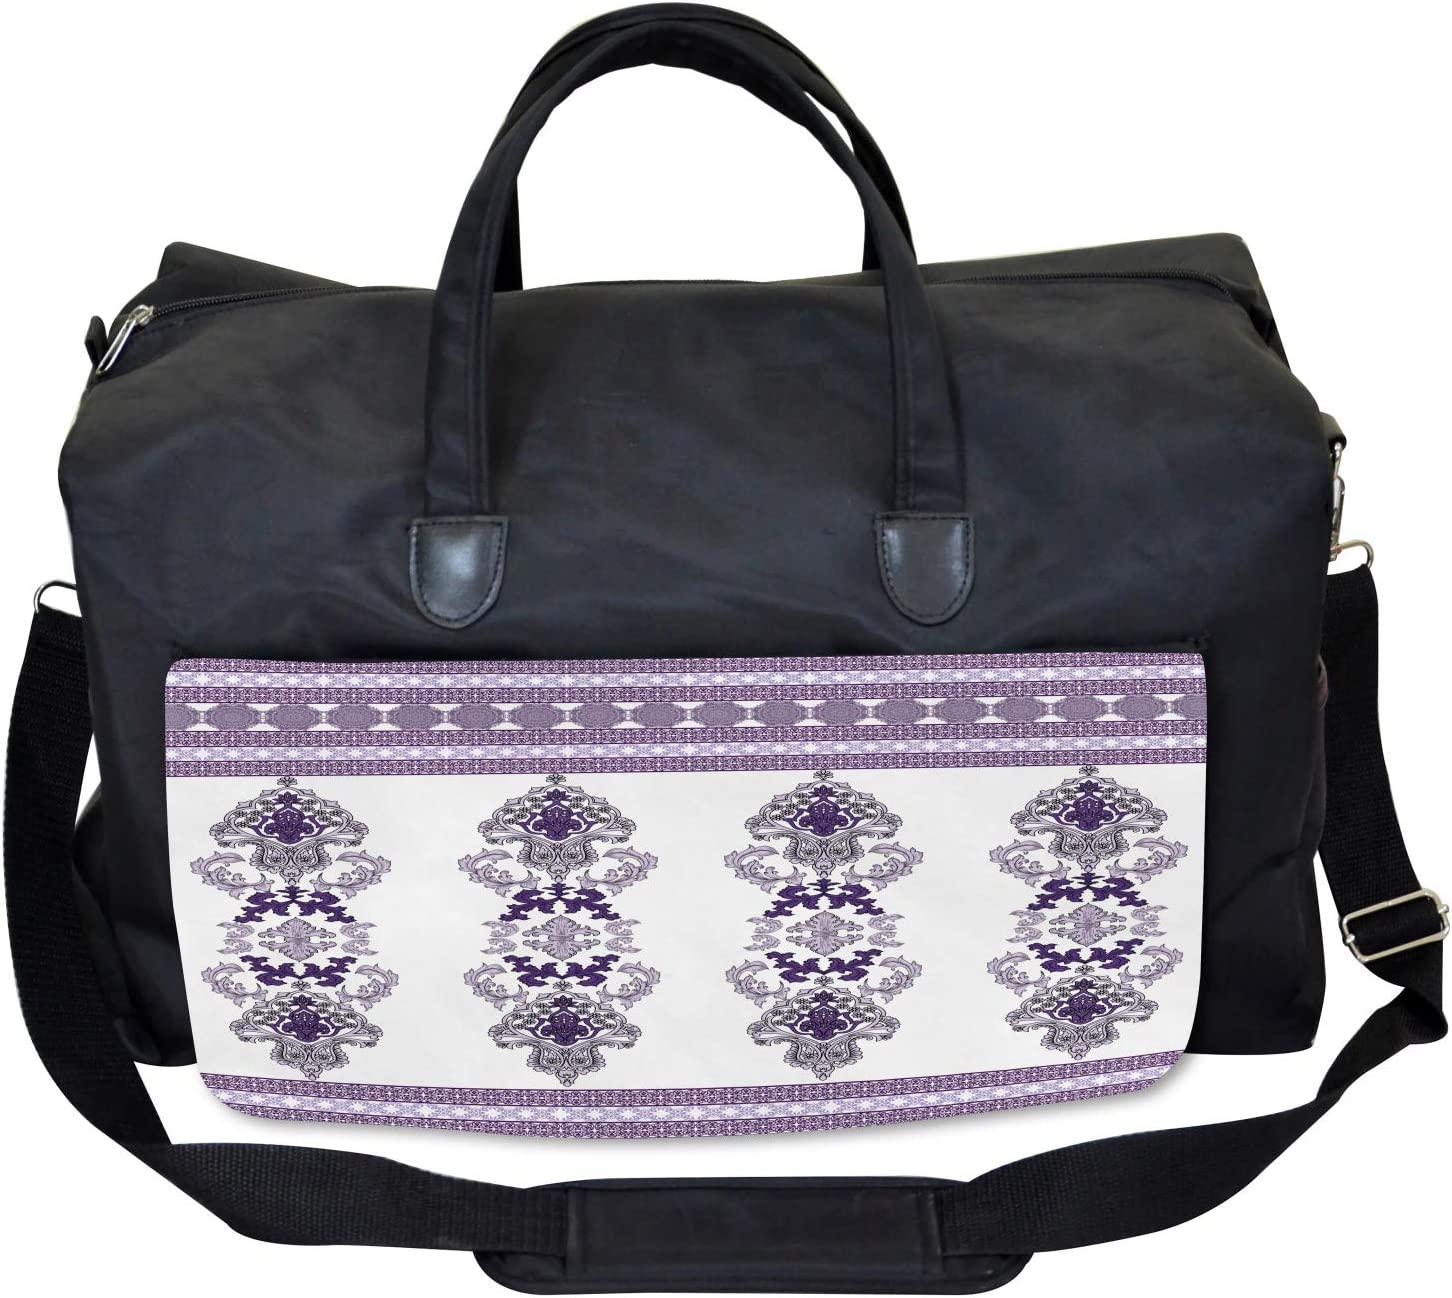 Ambesonne Damask Gym Bag Middle Eastern Motifs Large Weekender Carry-on